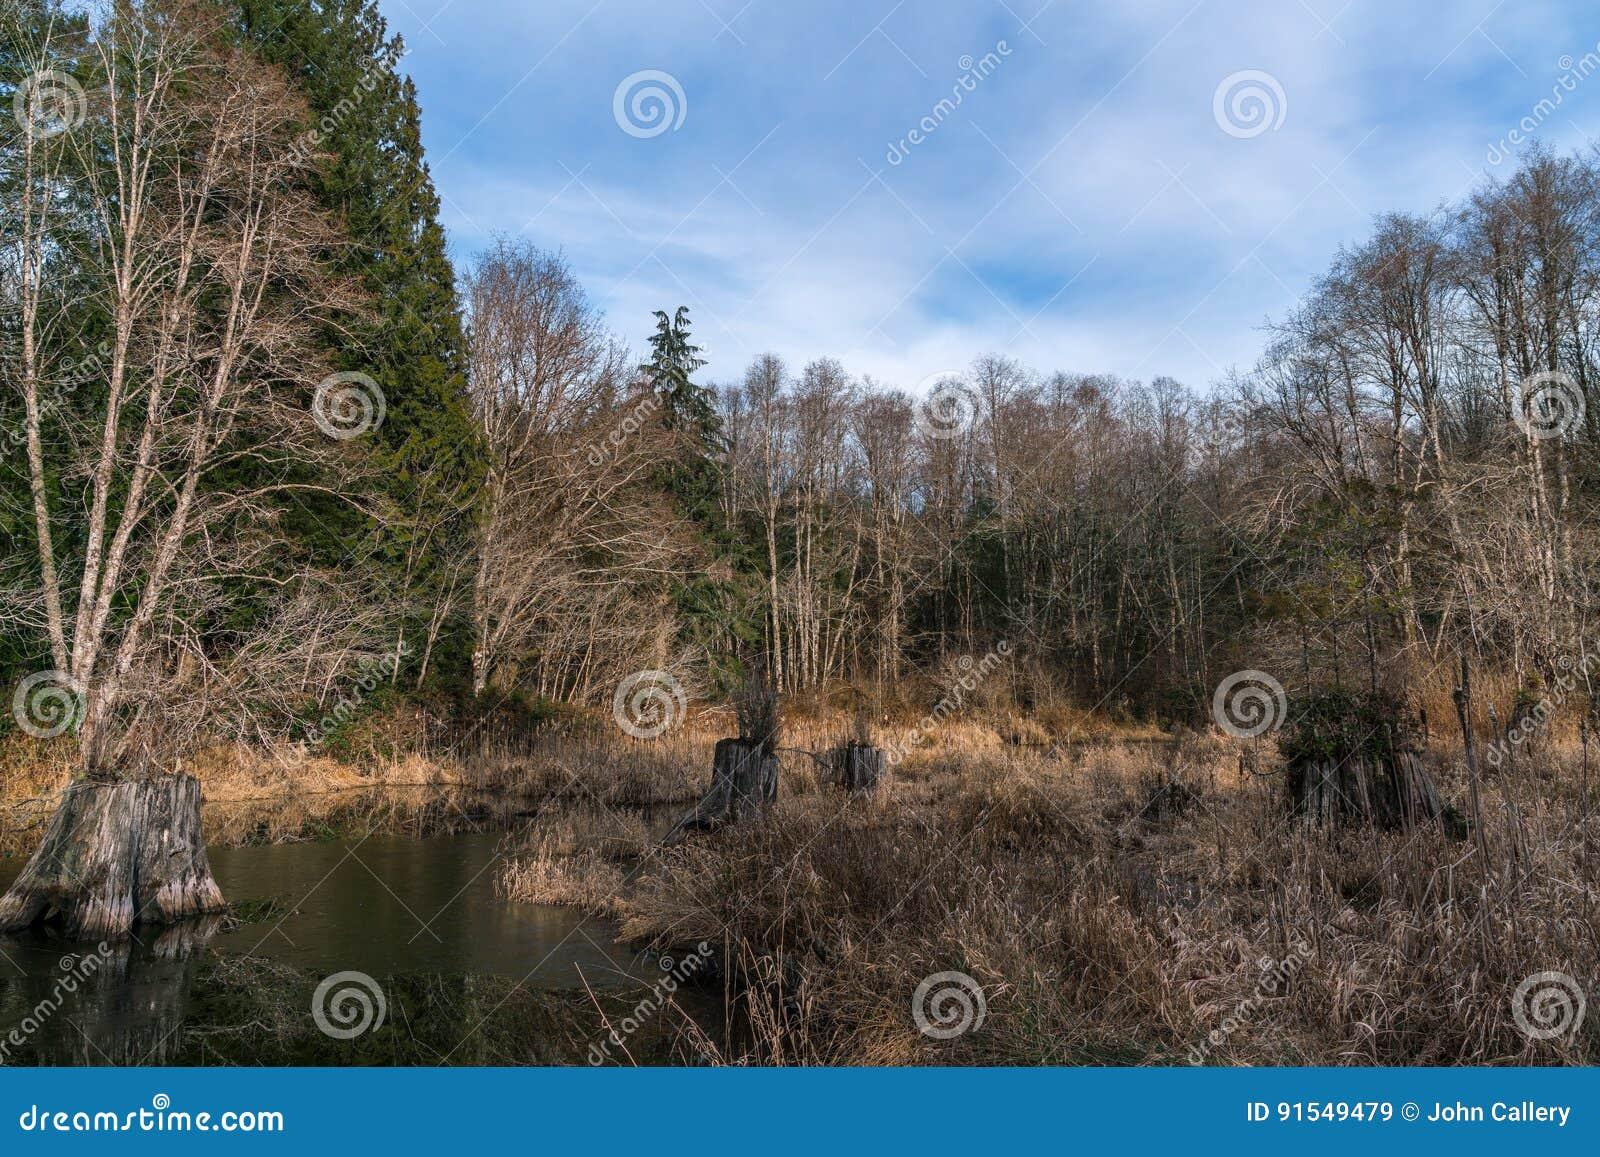 Bare beaver pics